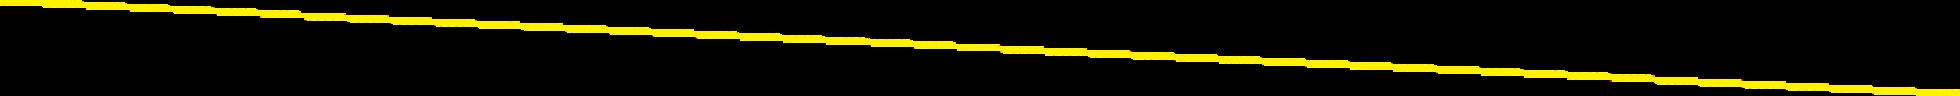 Angled_Line-Yellow down.png